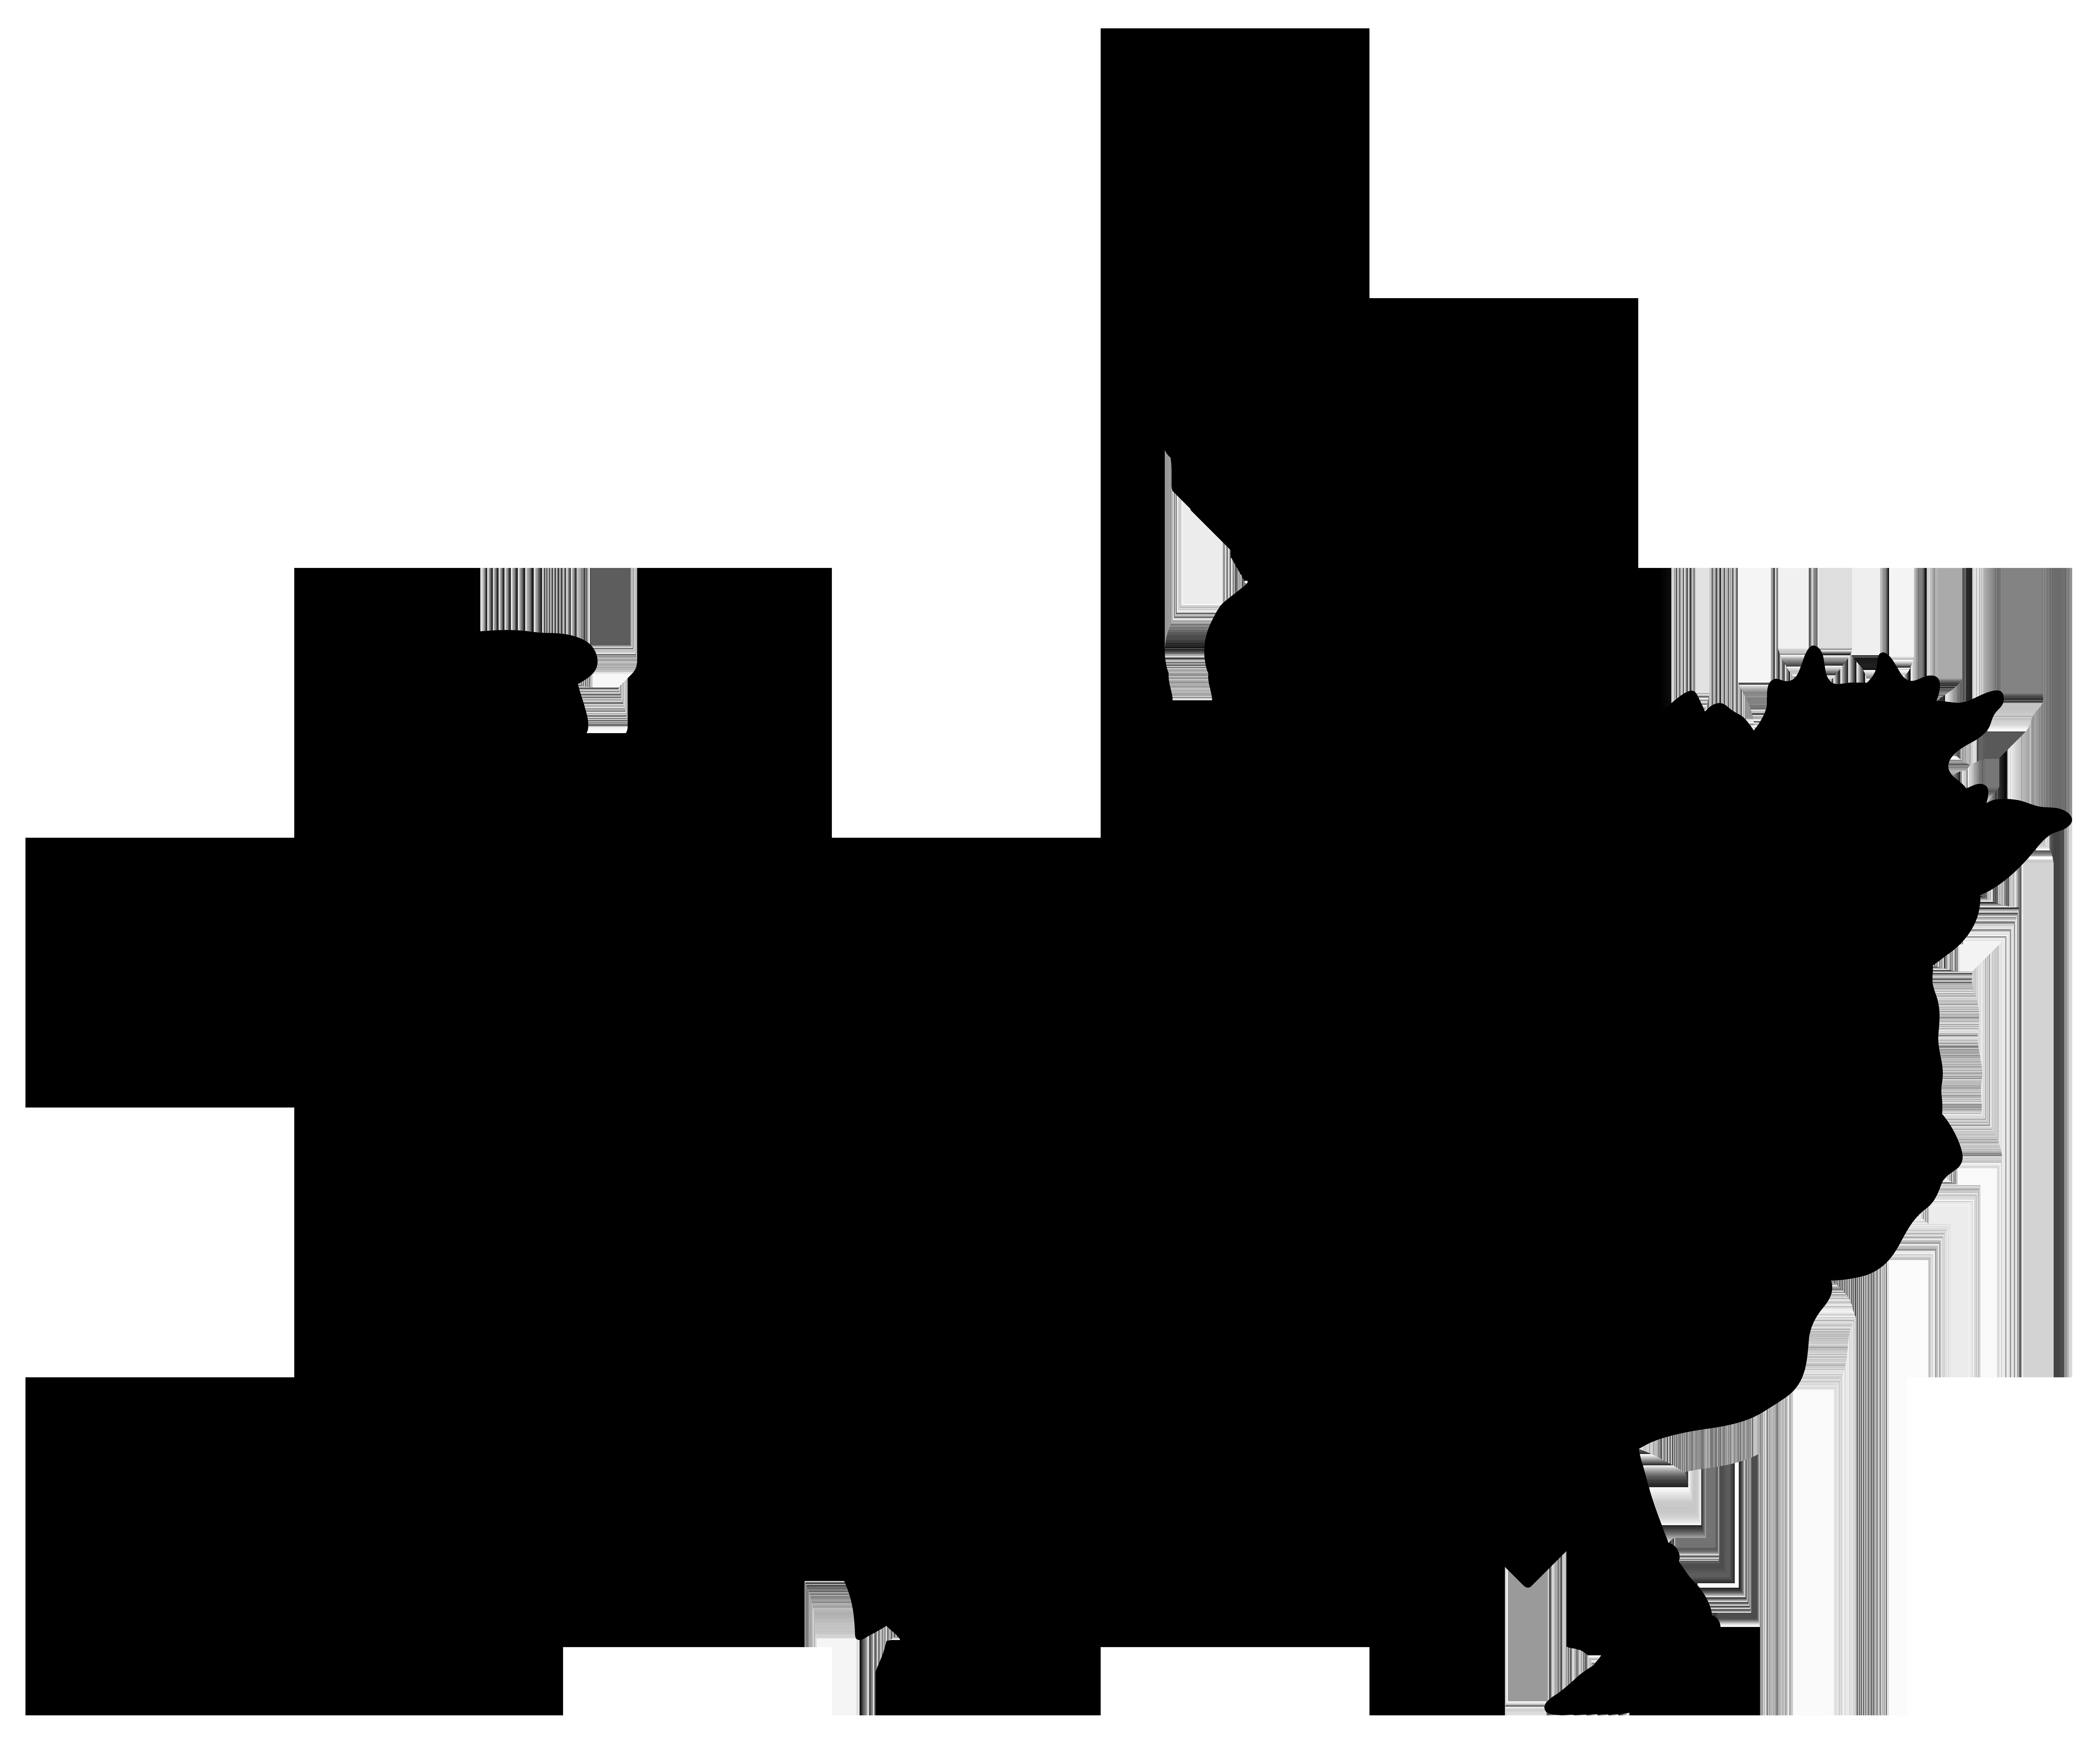 dancer silhouette transparent background at getdrawings com free rh getdrawings com transparent background clipart png transparent background clipart download